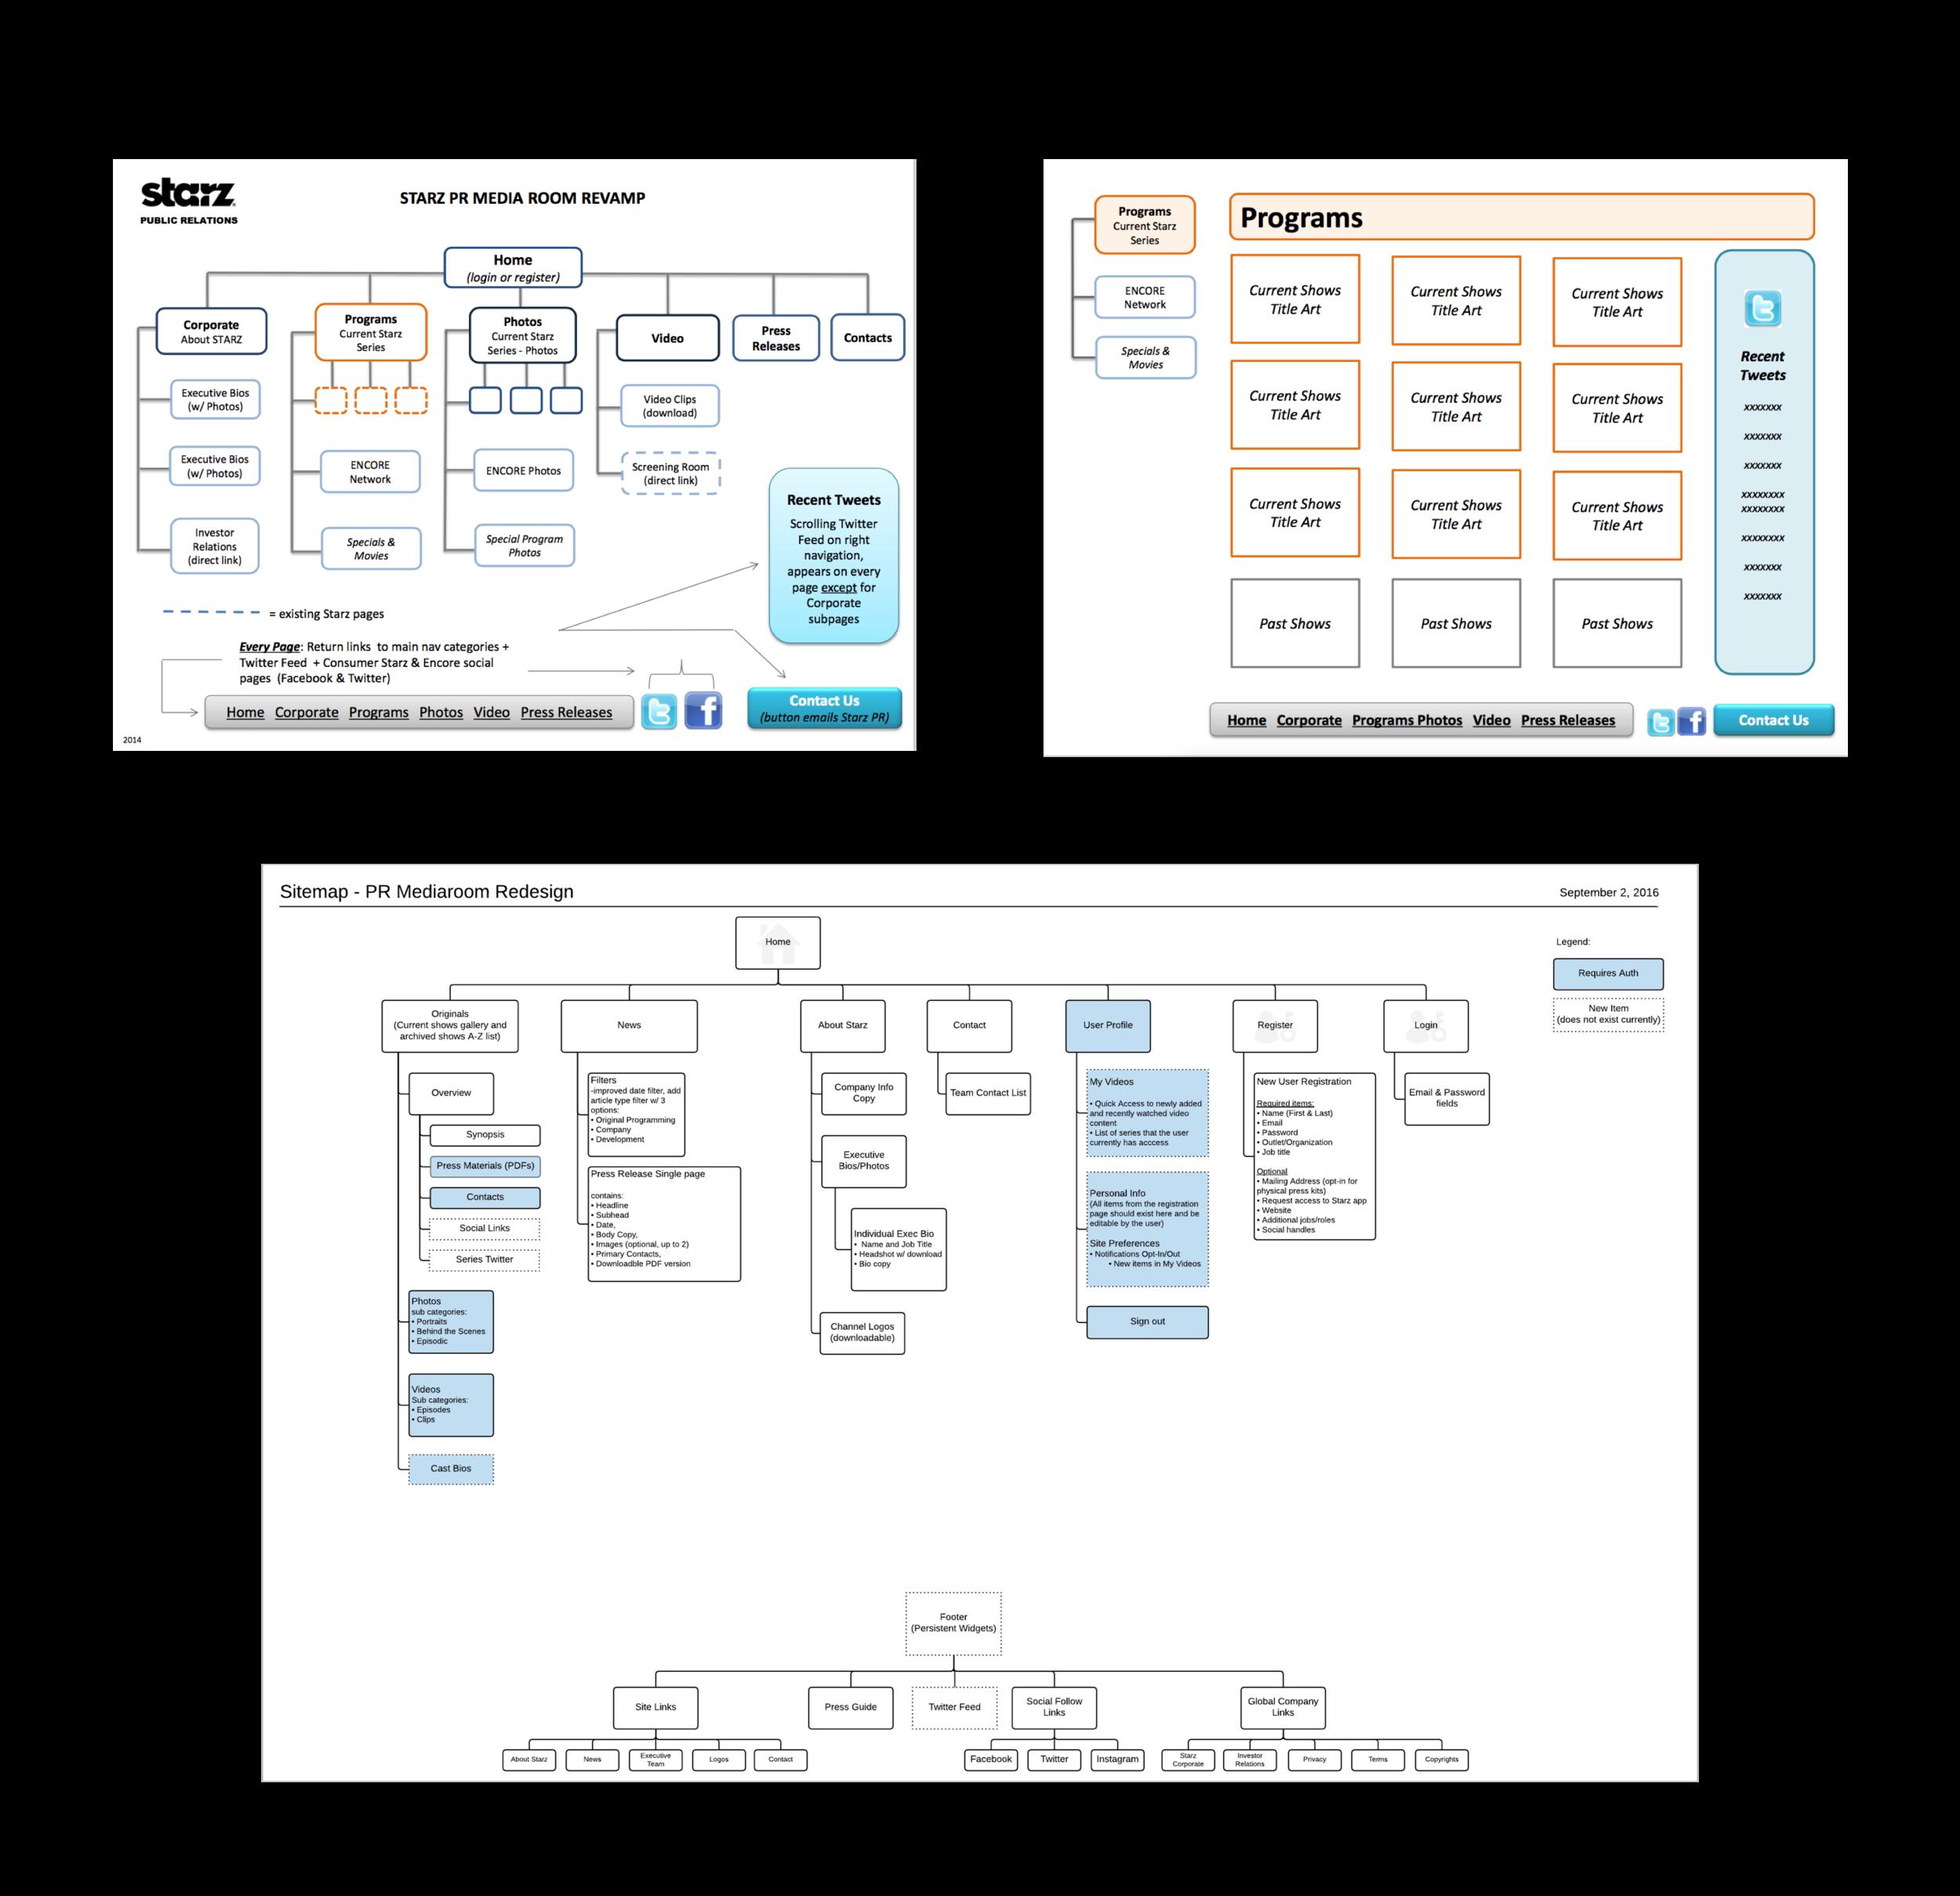 redesign_PRsitemap.png